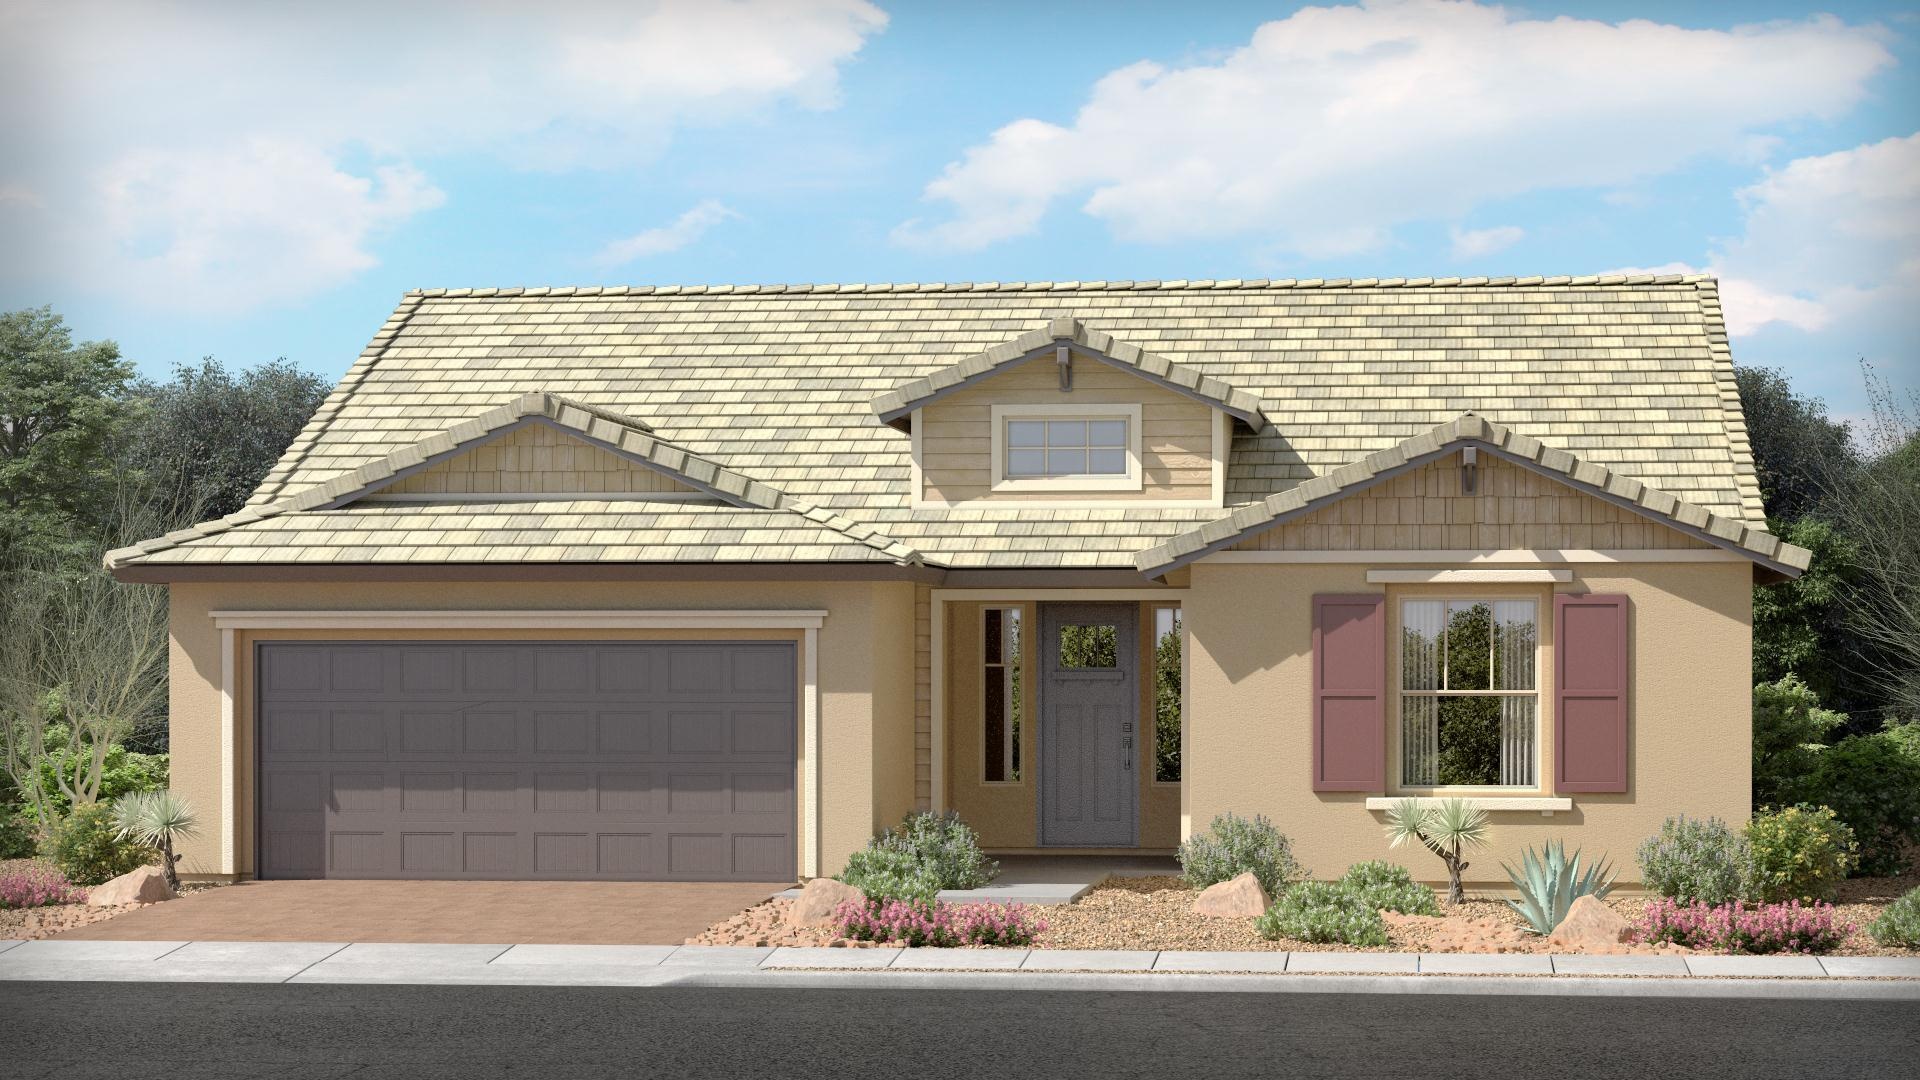 Exterior featured in The Topaz | Plan 45.1750 By Brown Homes AZ in Prescott, AZ